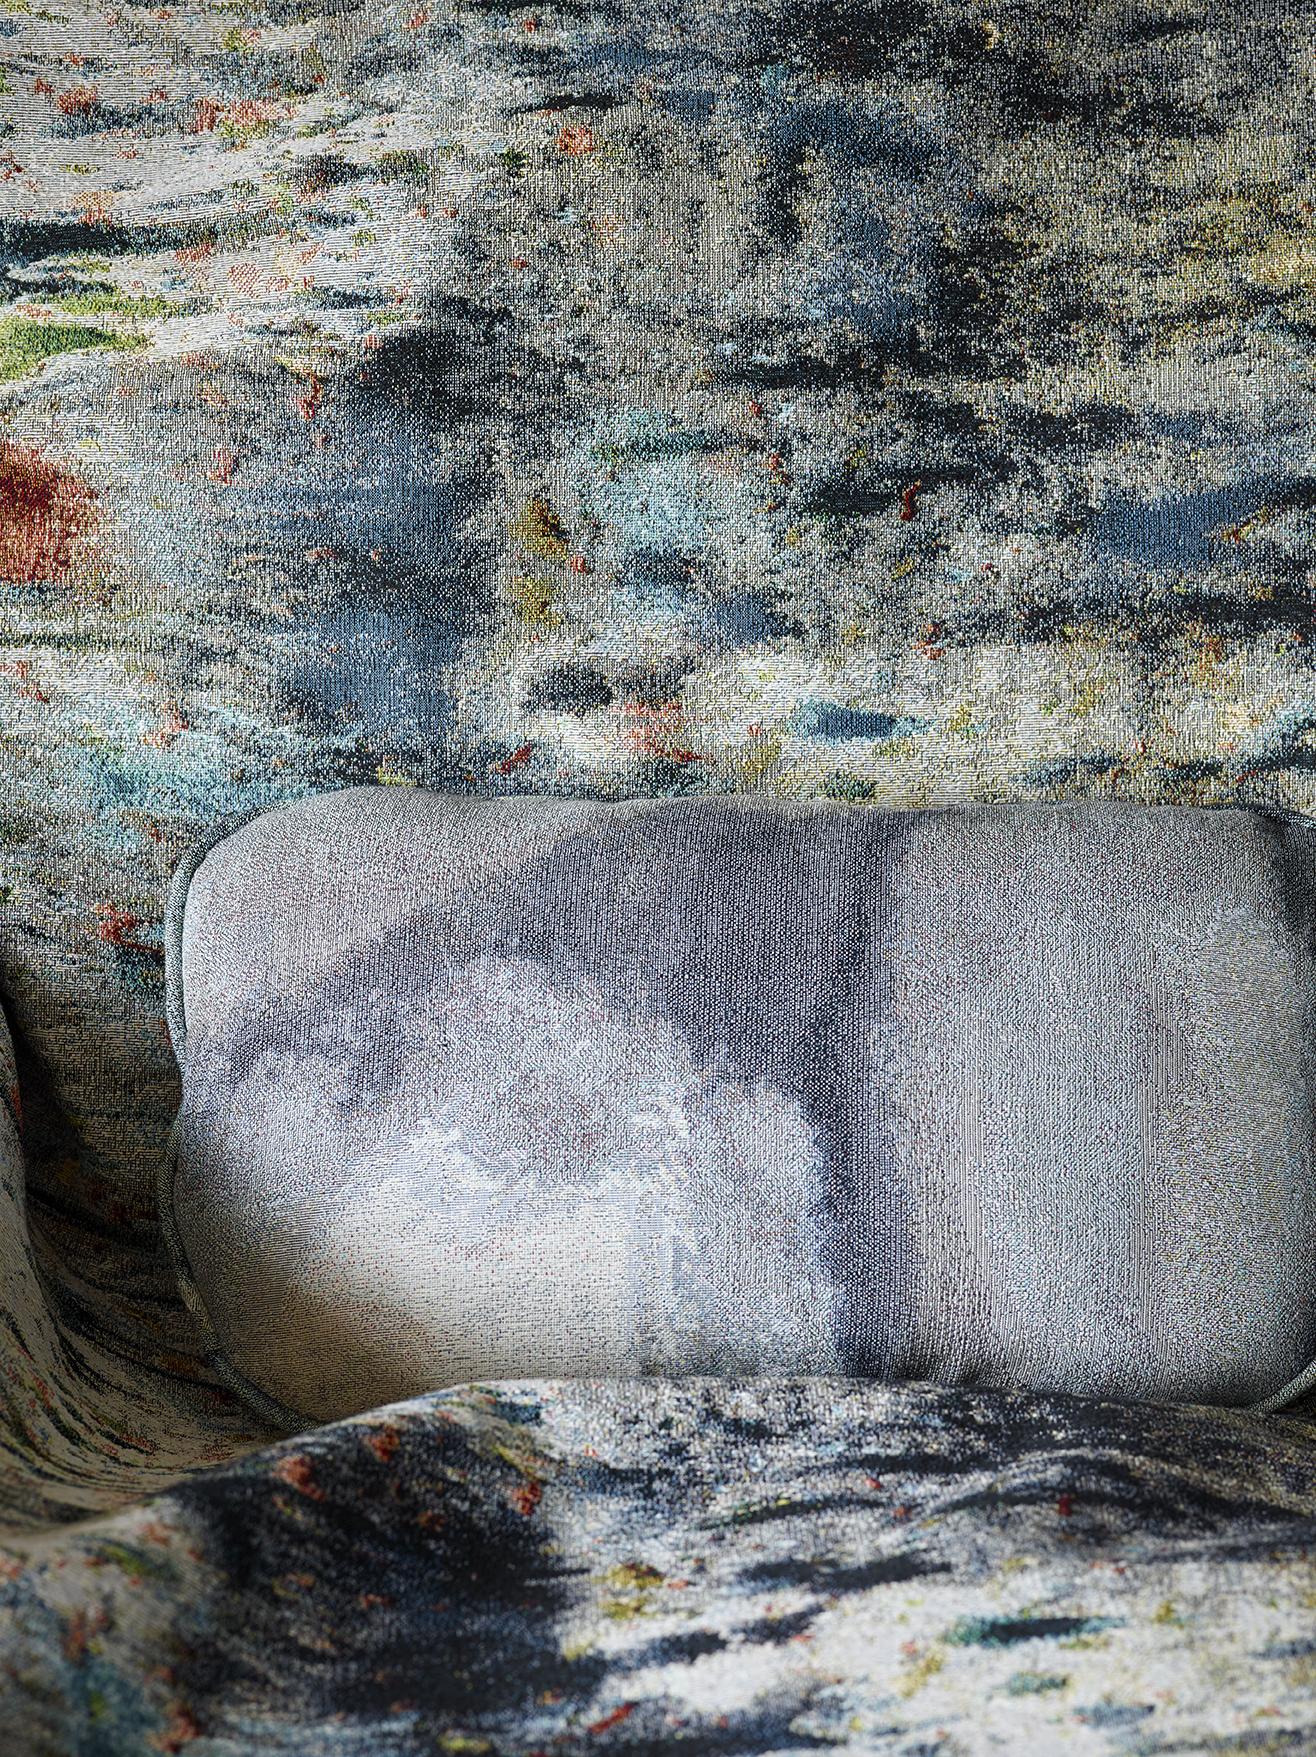 TAE drippy rockpool pillow detail.jpg